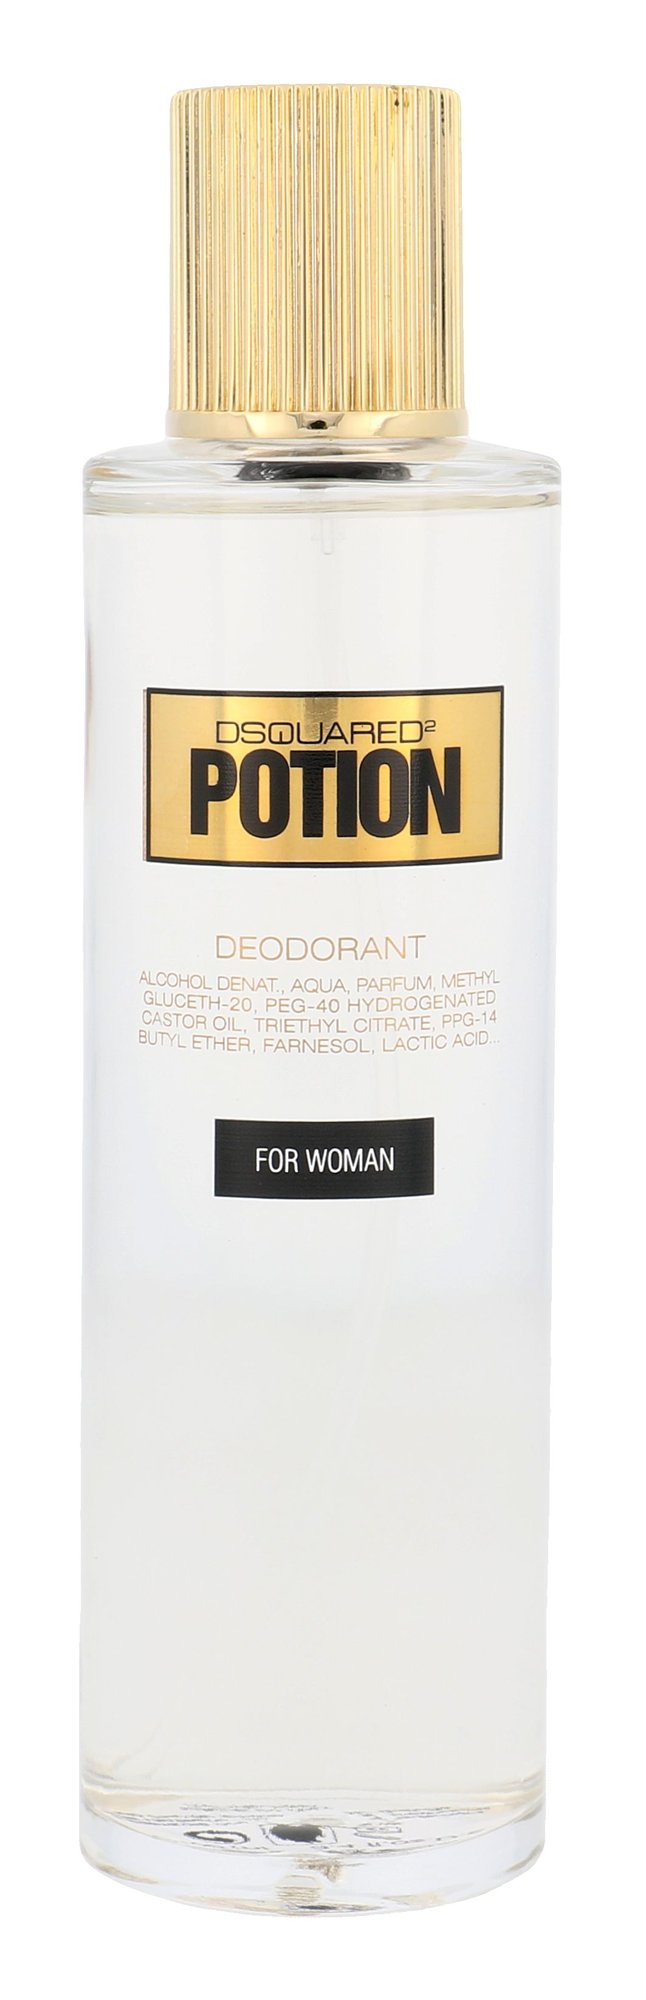 Dsquared2 Potion Deodorant 100ml